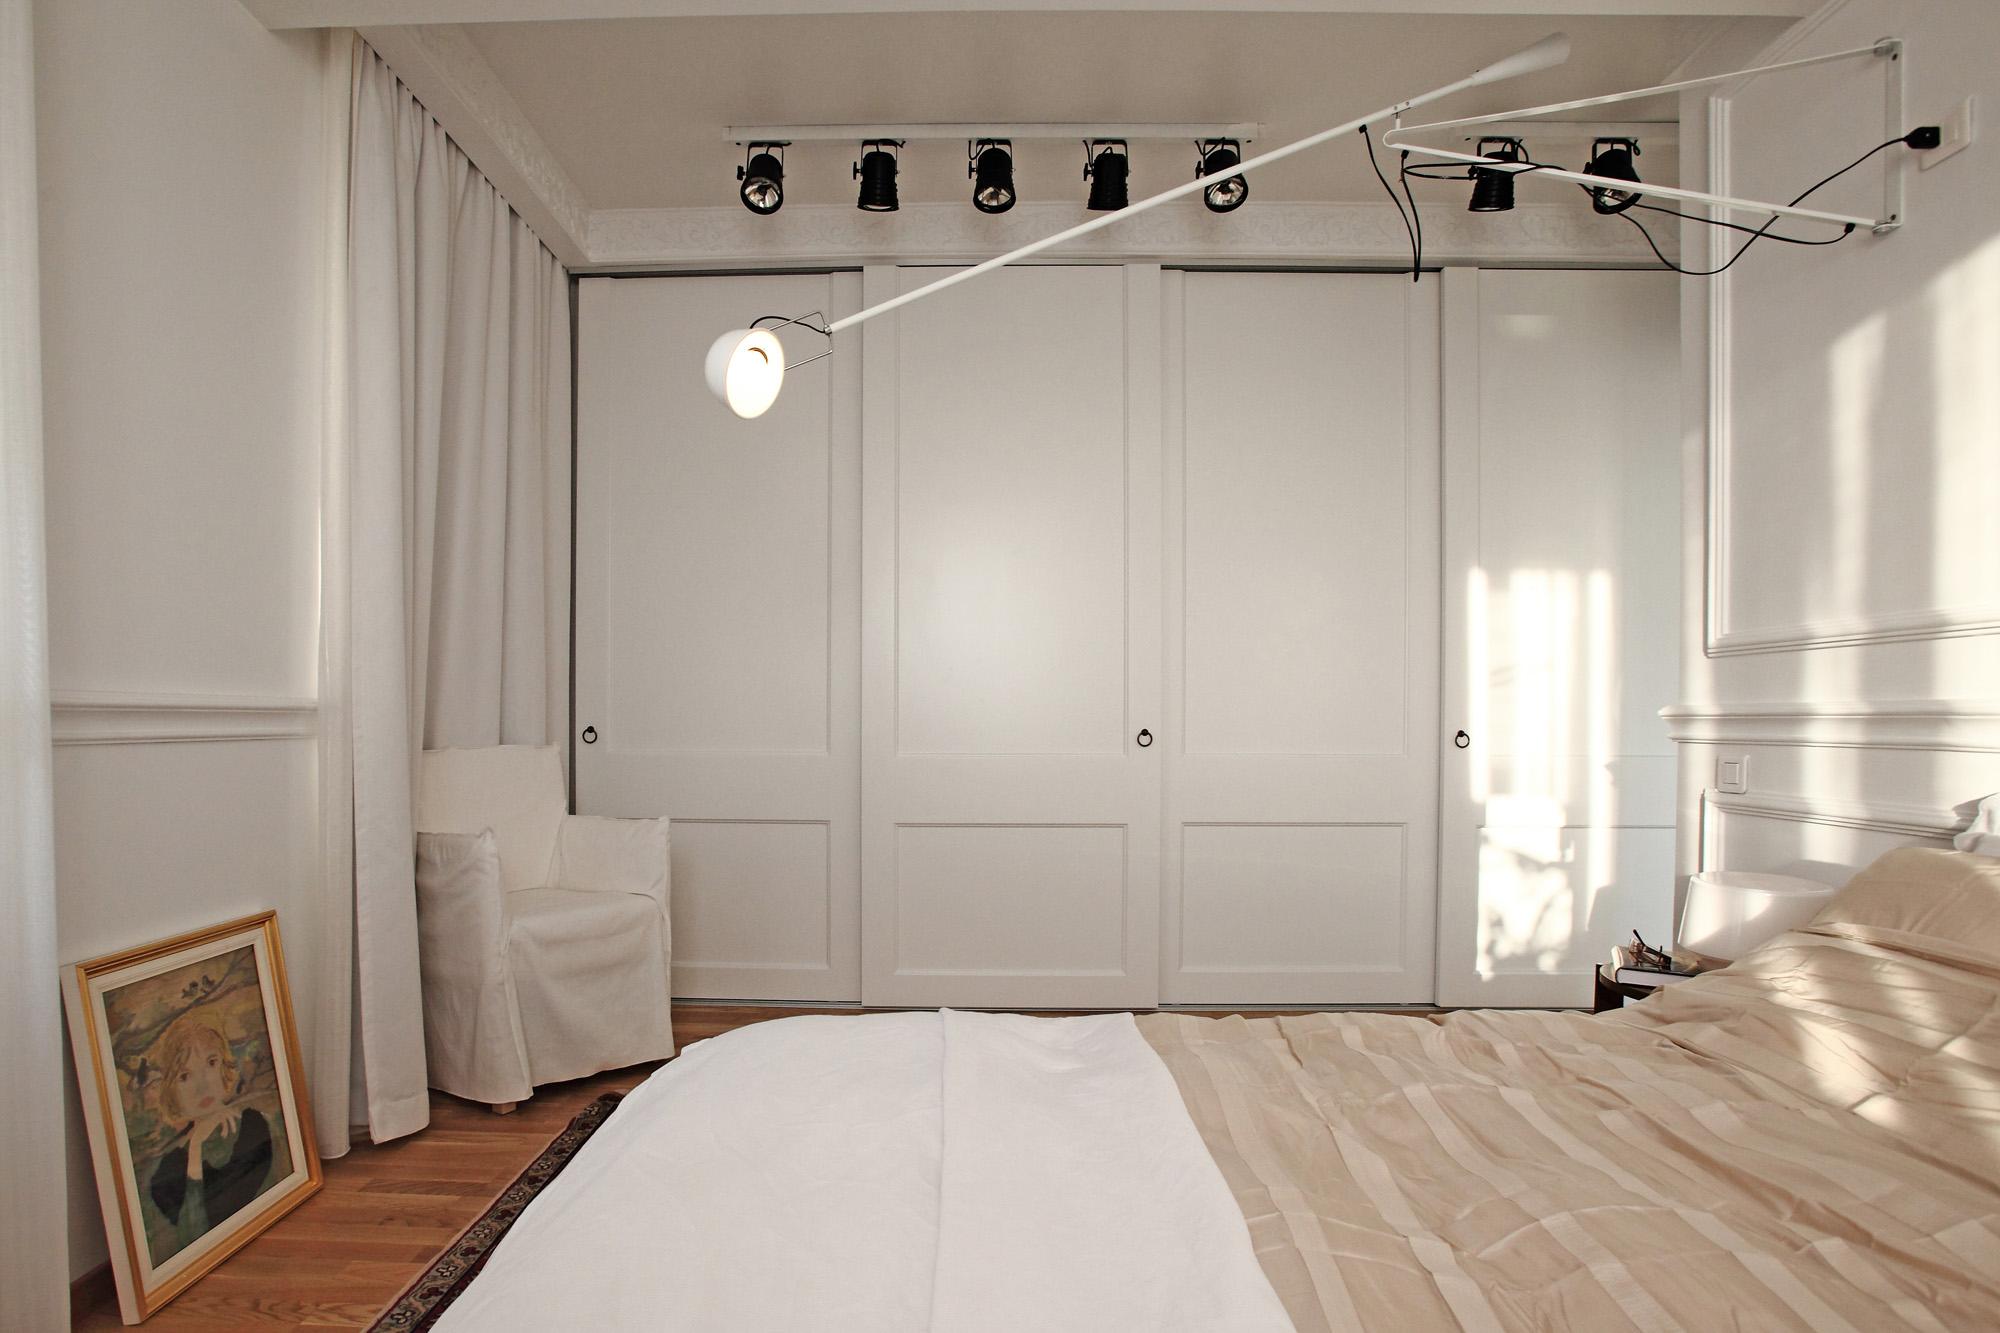 https://ahe-ro.s3.amazonaws.com/12332/apartament-elegant-cu-4-camere-si-terase-generoase-in-centrul-bucurestiului-%283%29.jpg